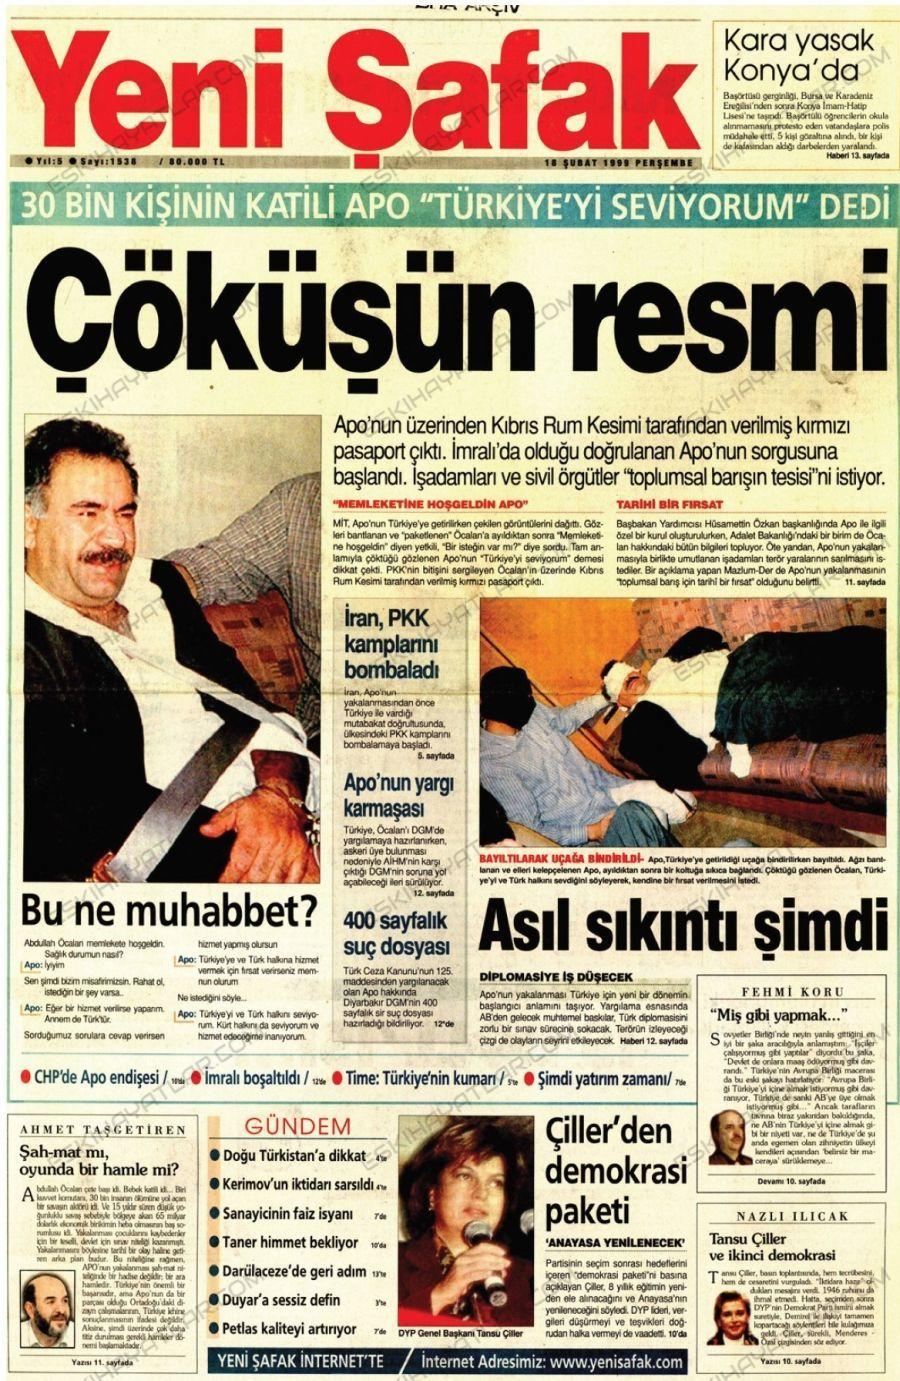 0223-abdullah-ocalan-ne-zaman-yakalandi-1999-yili-gazete-arsivleri-yeni-safak